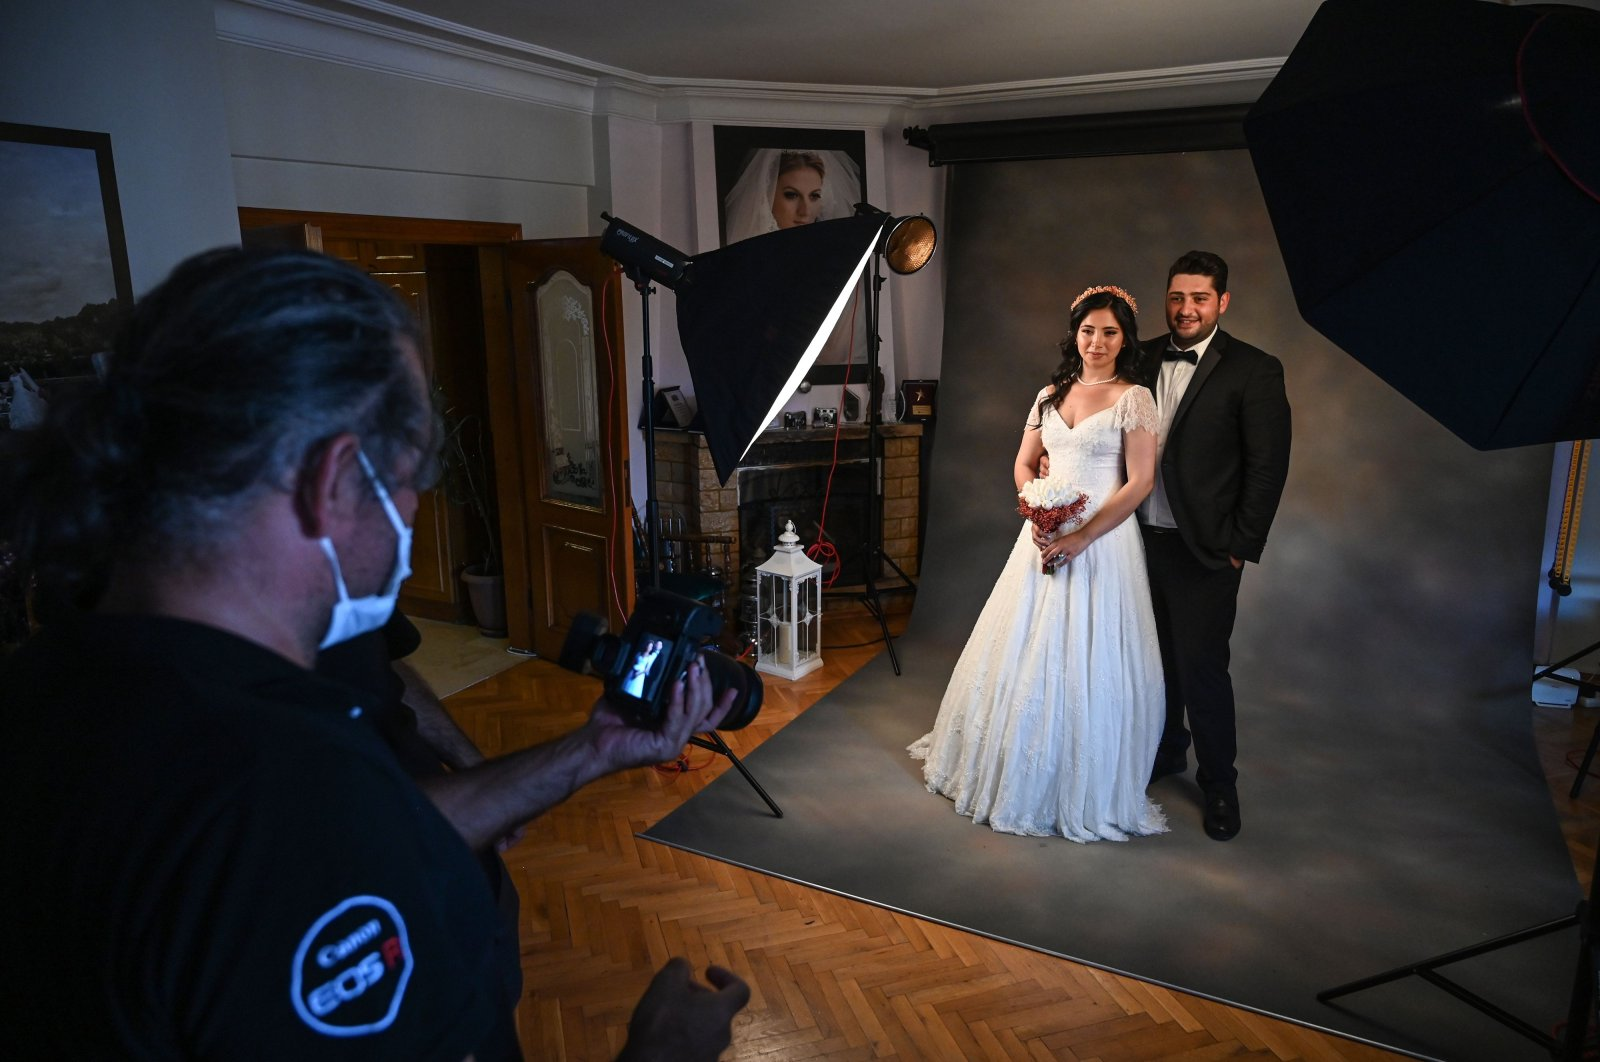 Ayşe Keleş and her husband Alp Çolak pose for a wedding photo shoot, in Istanbul, Turkey, Sept. 5, 2020. (AFP Photo)